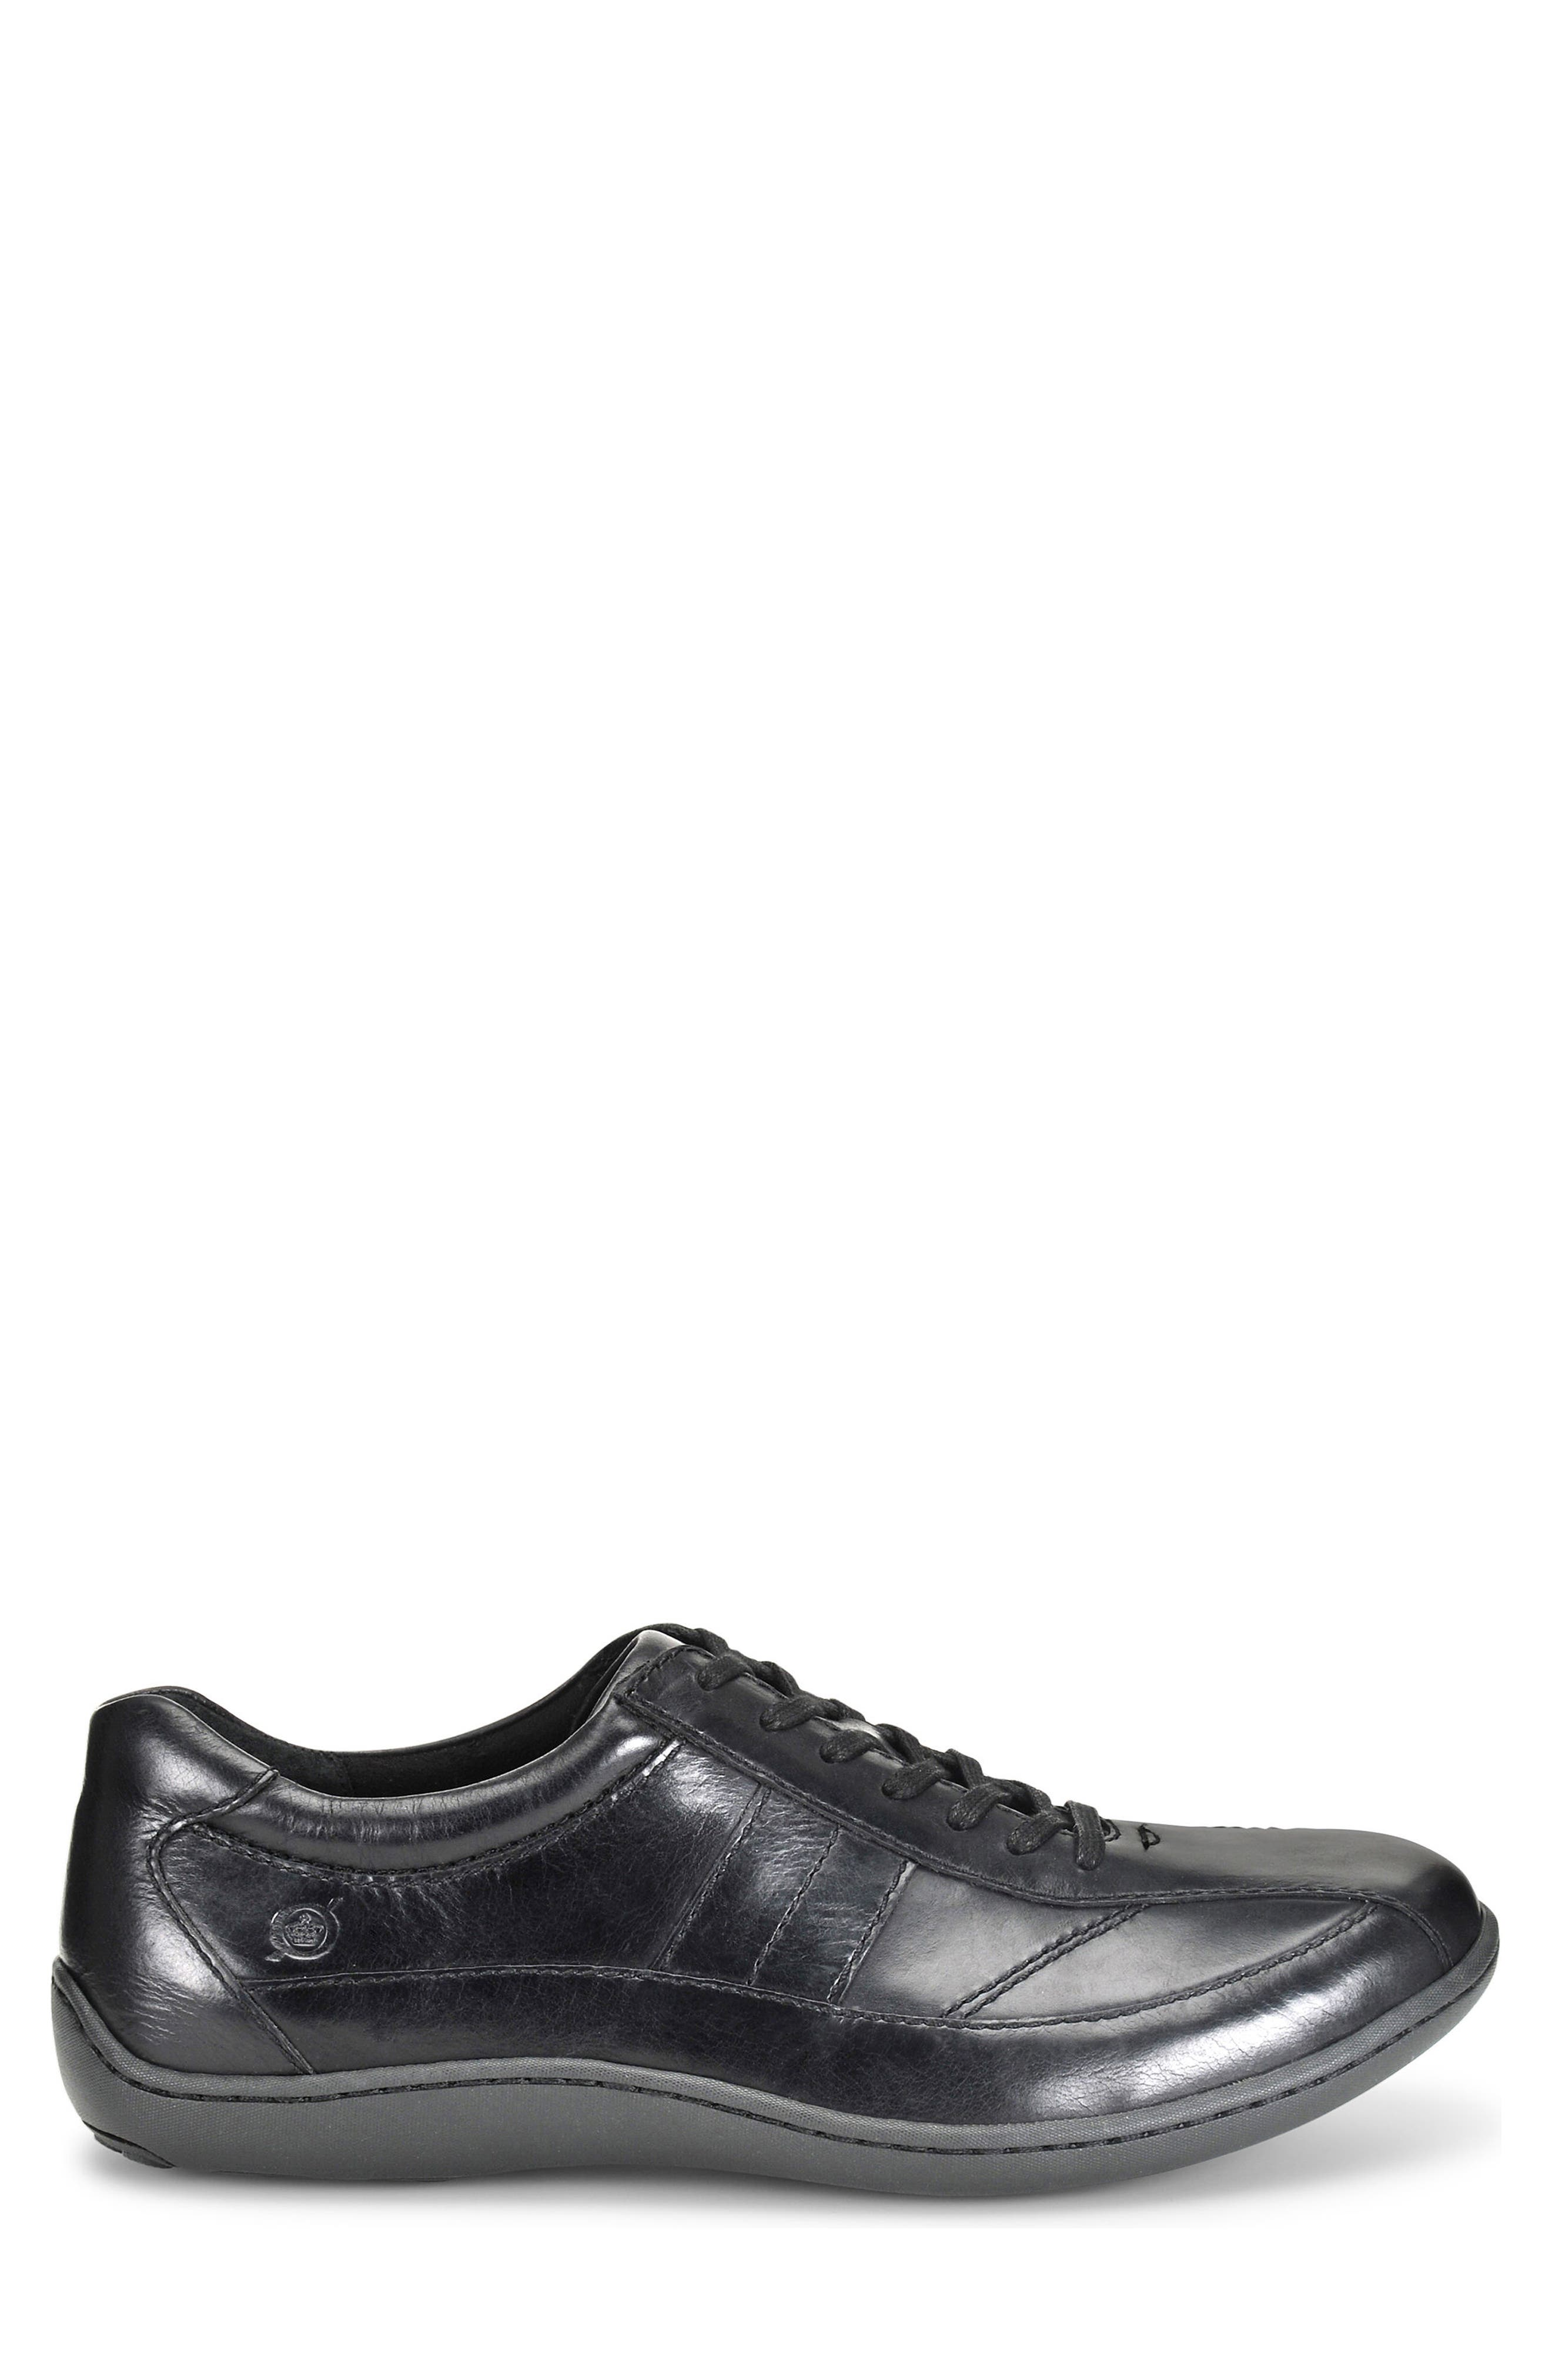 Breves Low Top Sneaker,                             Alternate thumbnail 3, color,                             Black